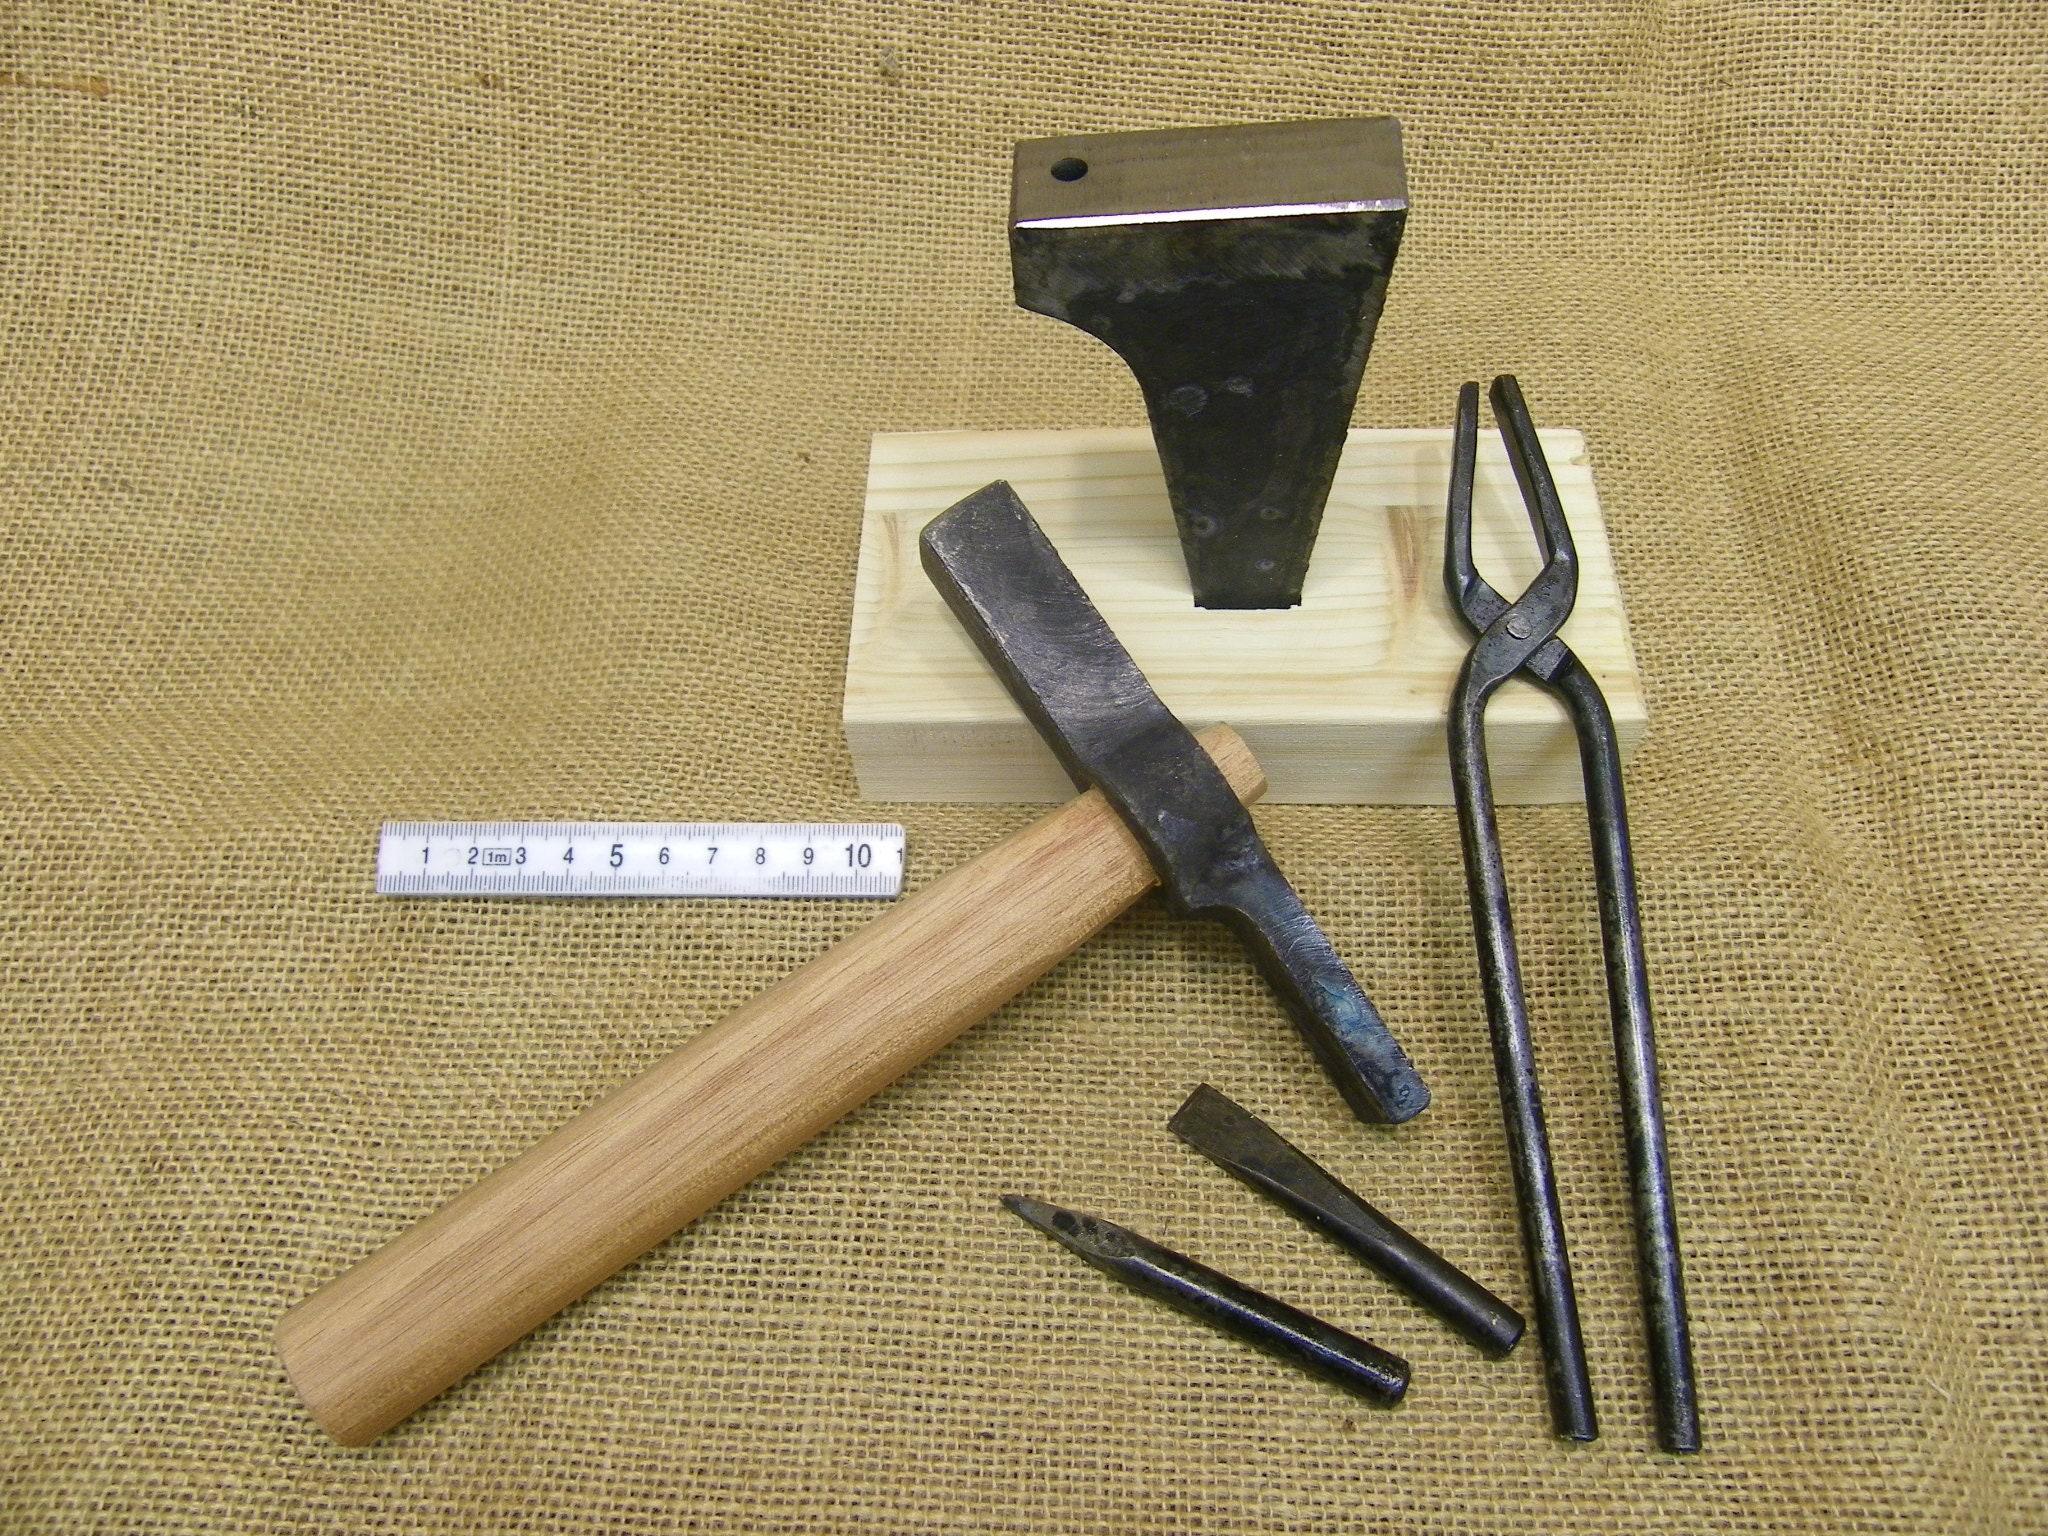 medieval smithing set 840g anvil 350g hammer pliers & chisel punch set